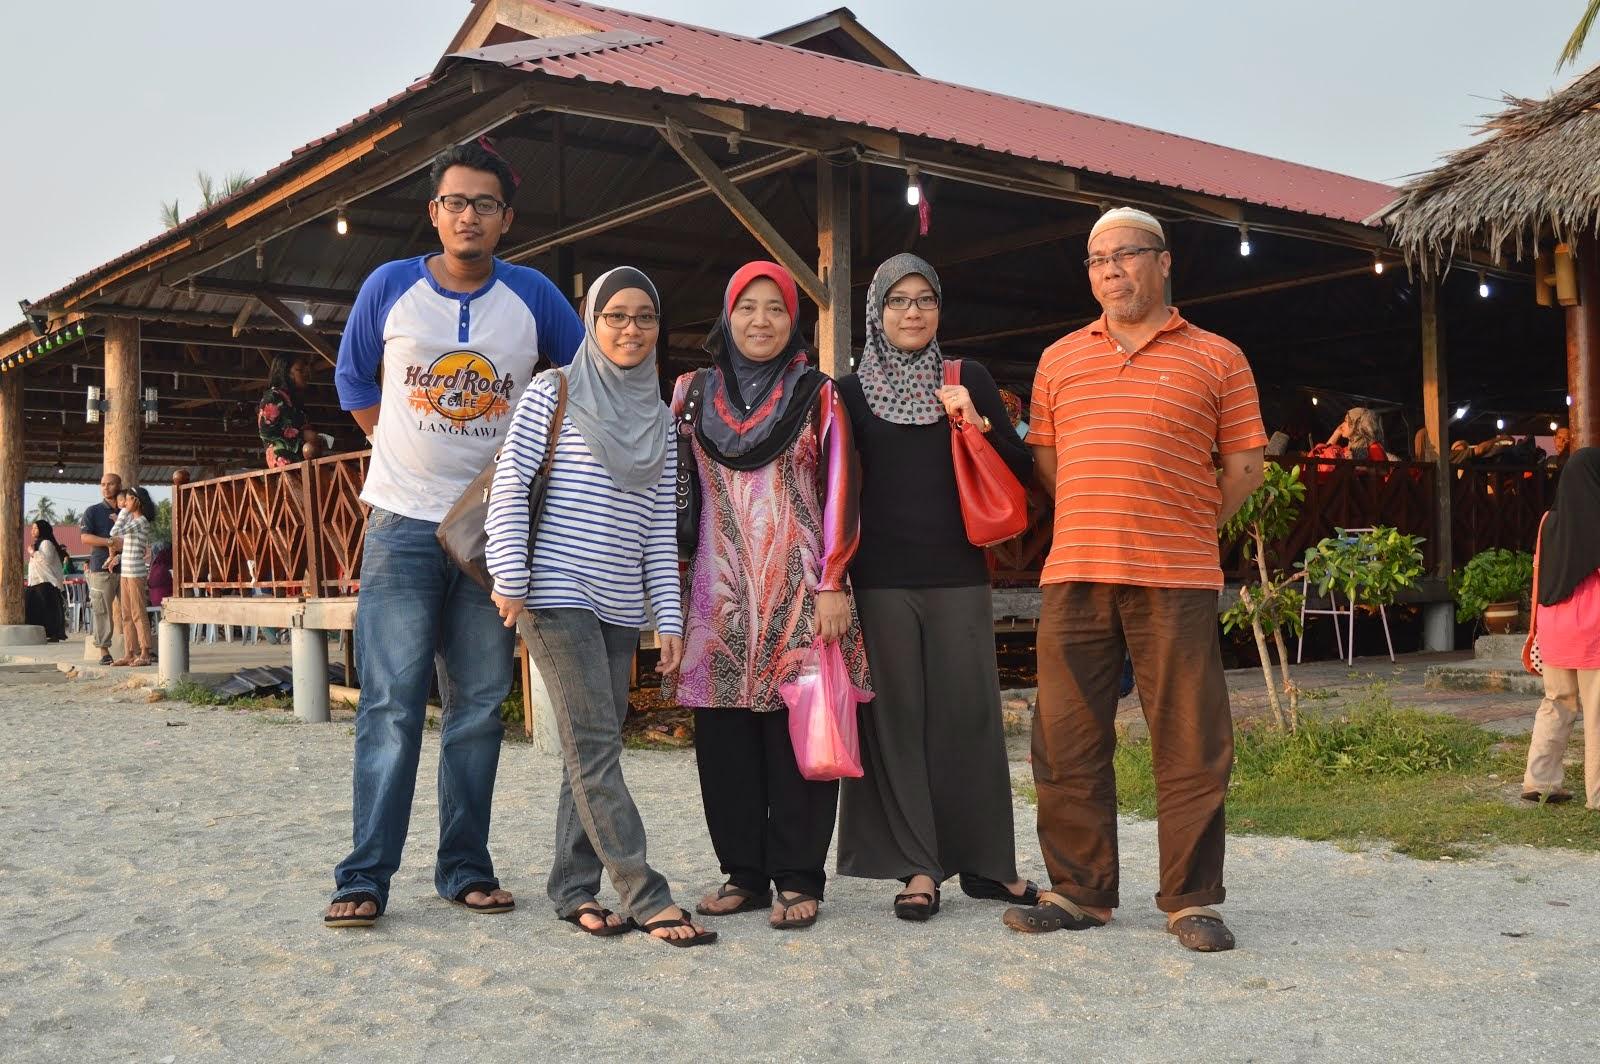 ♥ my family's ♥